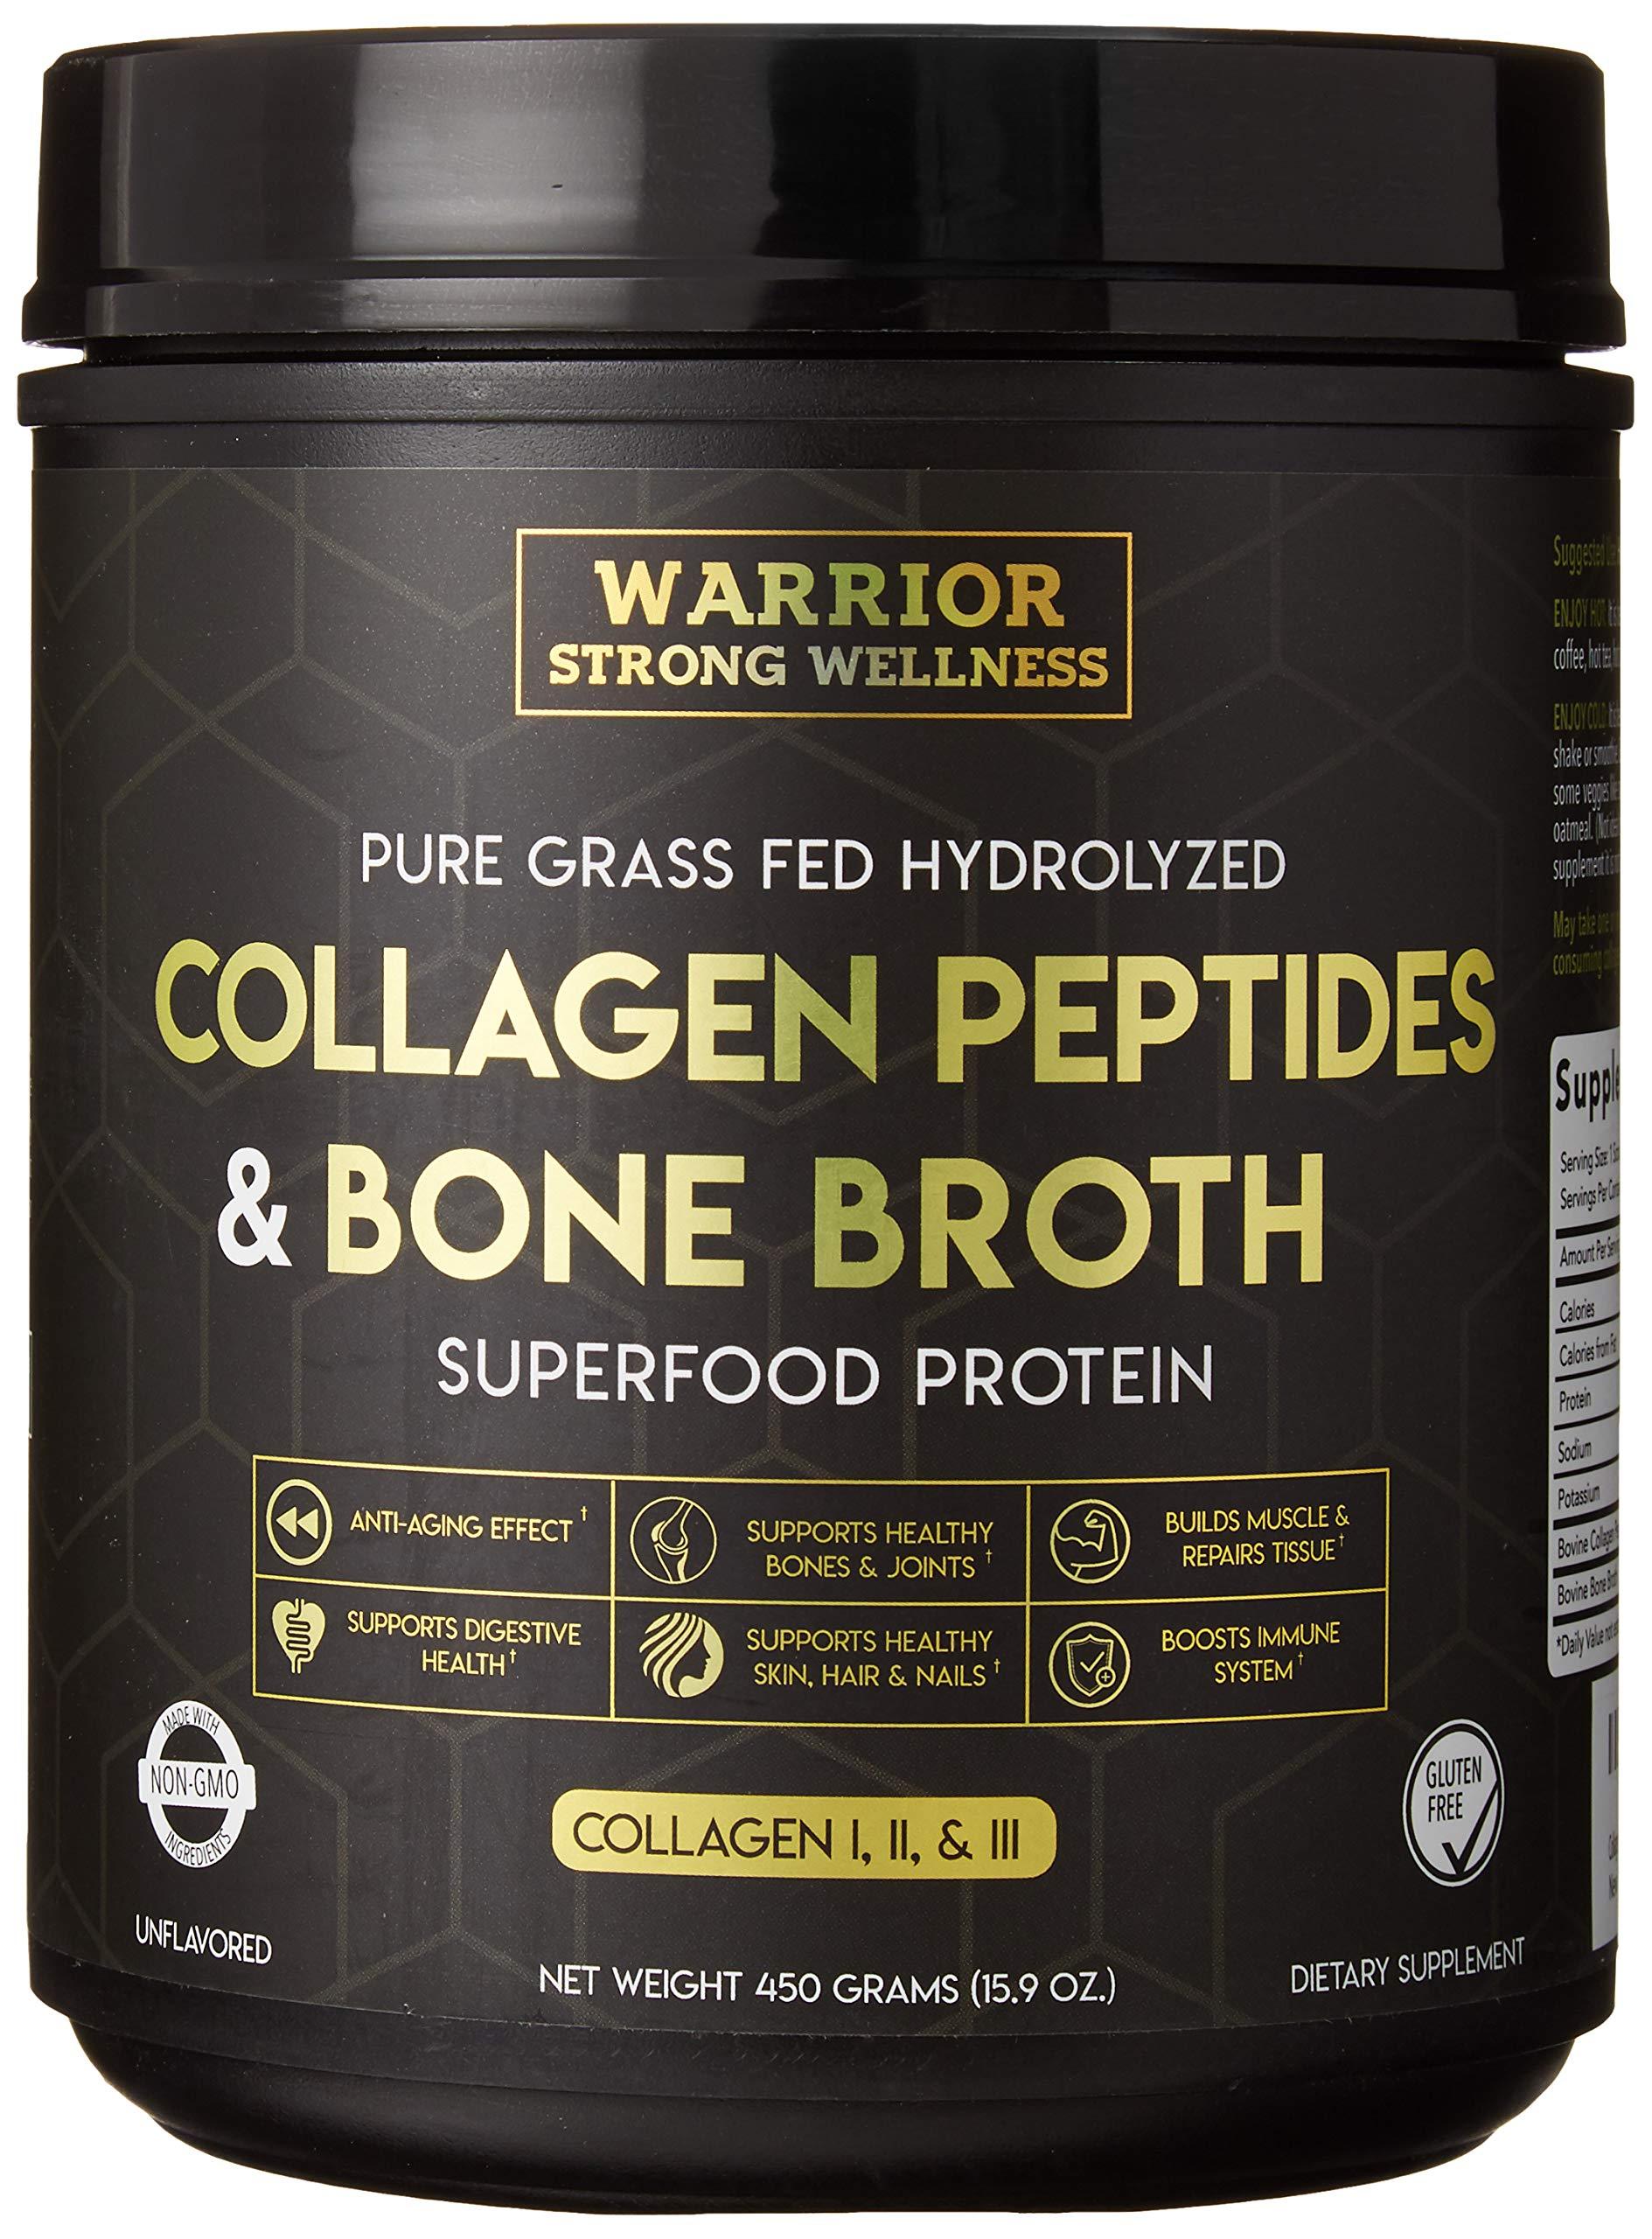 Premium Collagen Peptides Bone Broth by Warrior Strong Wellness: Grass Fed Hydrolyzed Collagen Protein Powder Boost